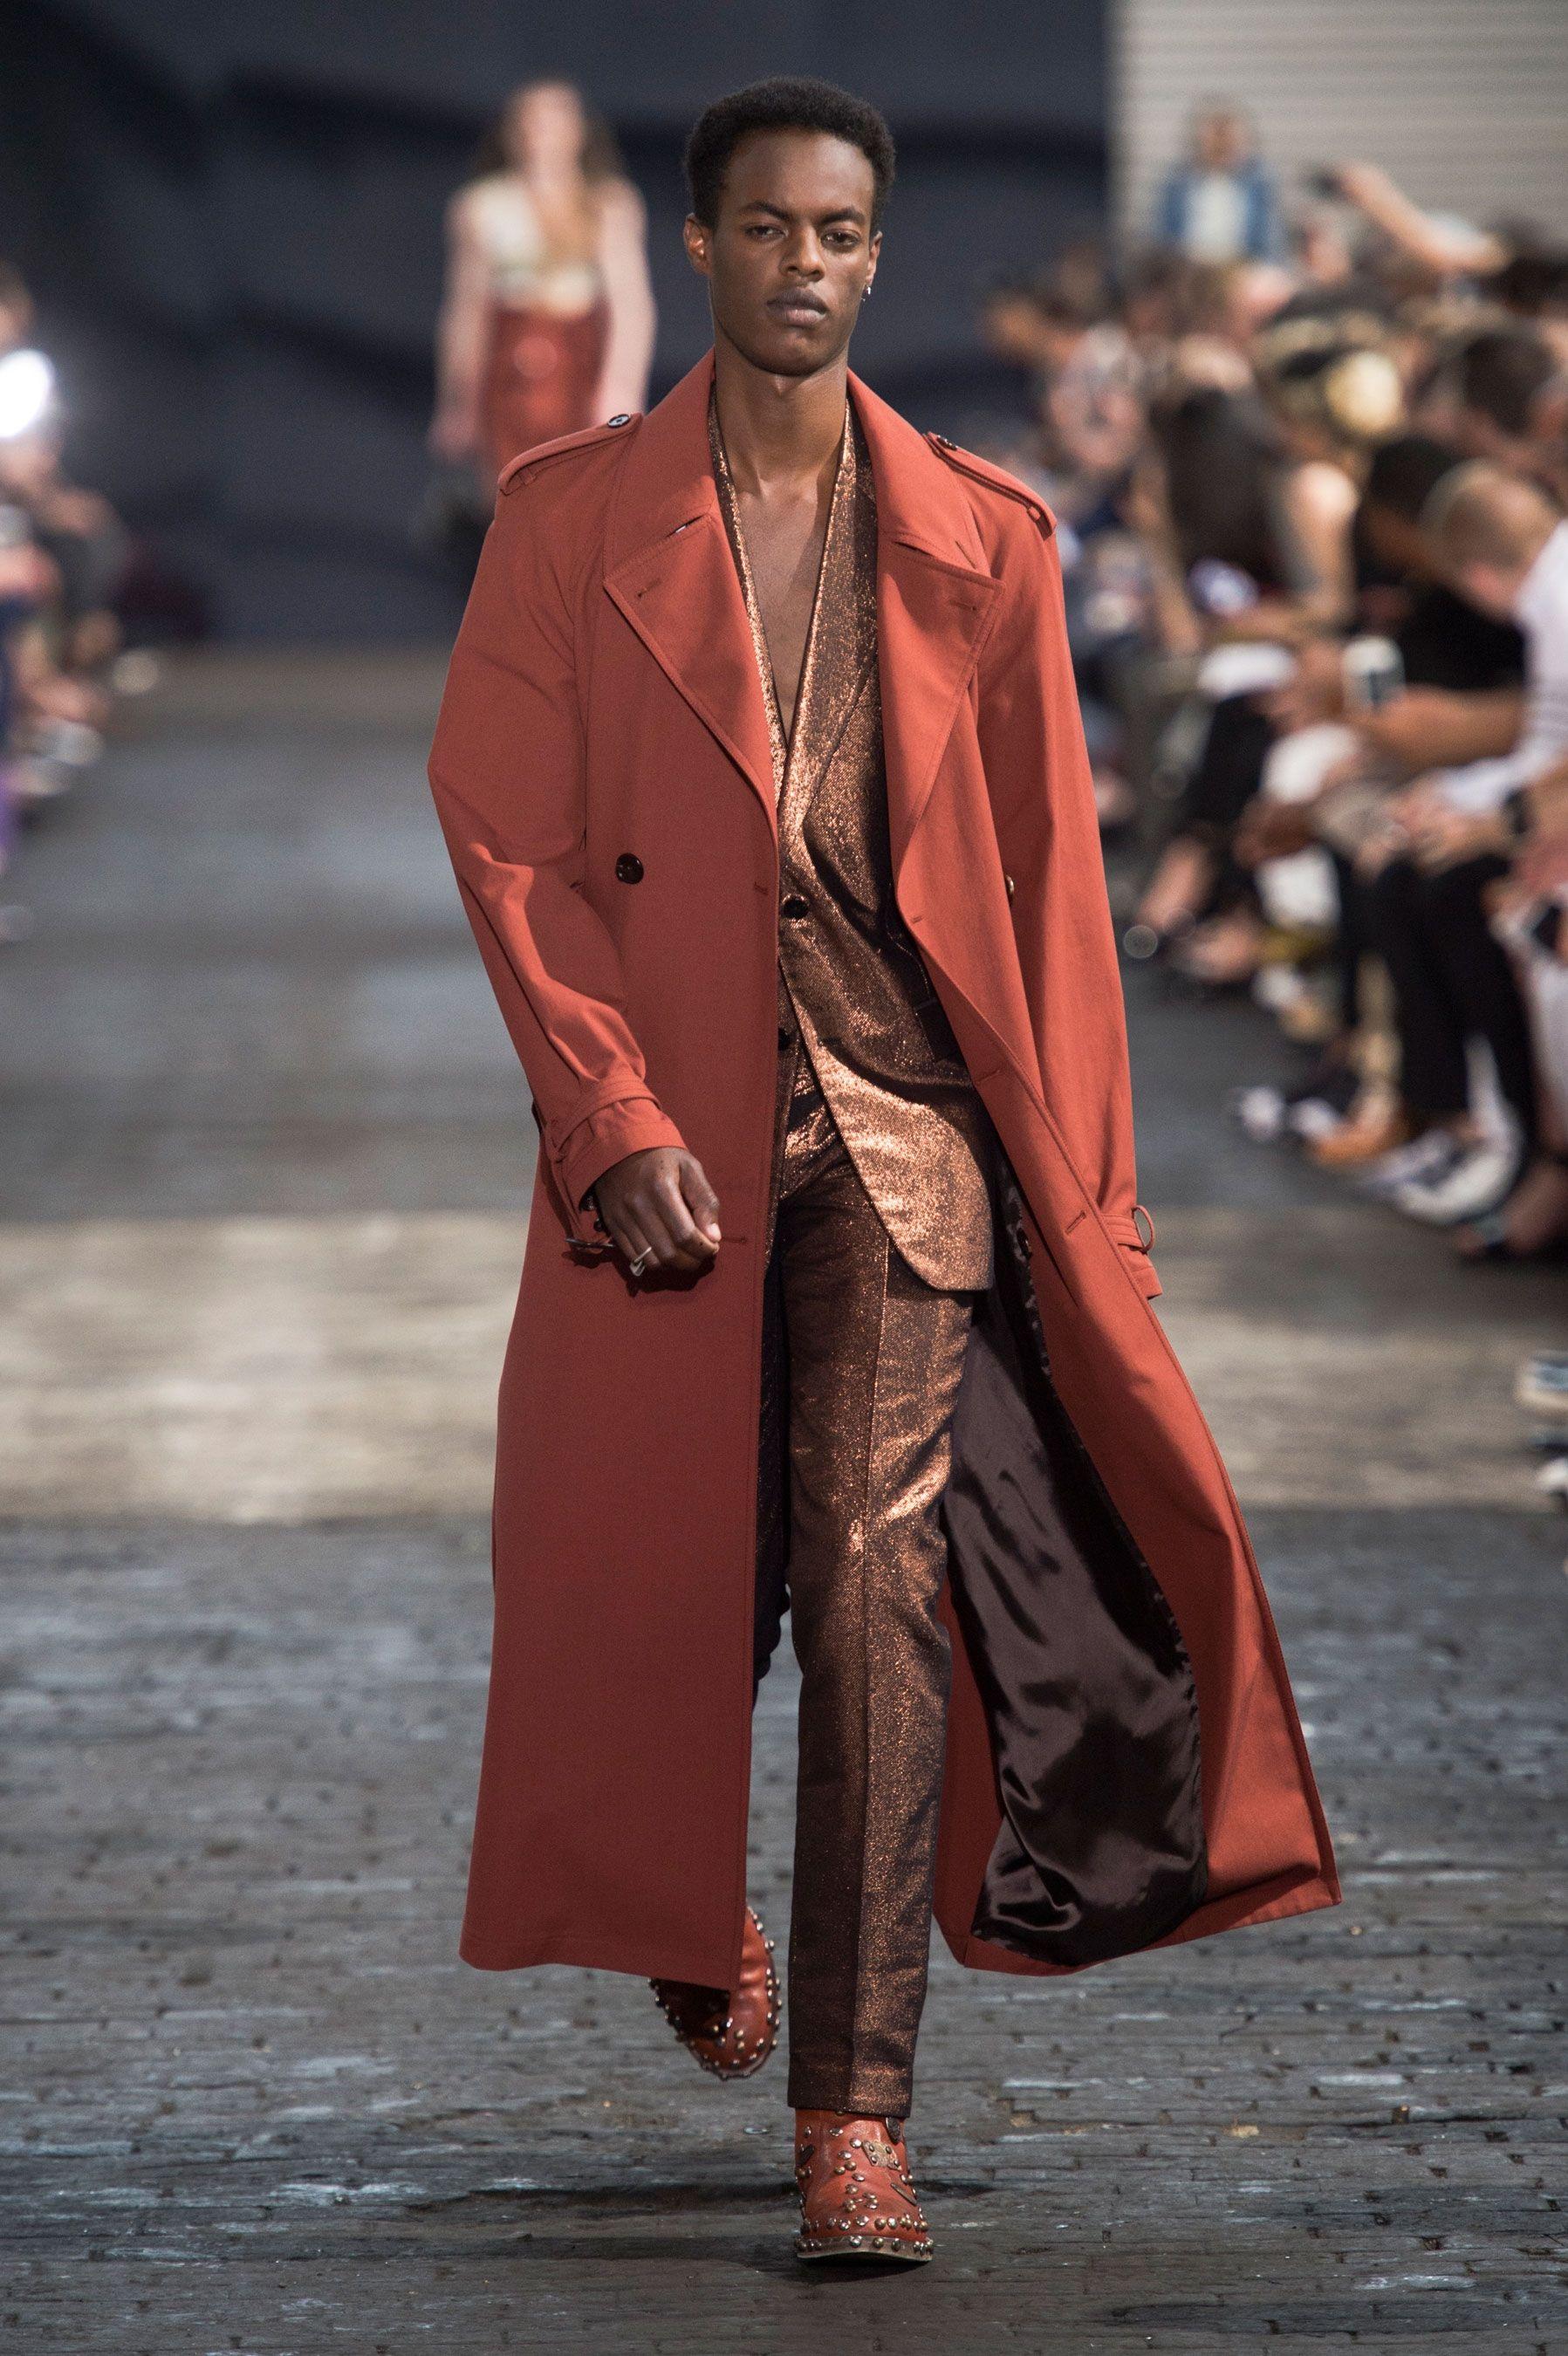 Maison Margiela SpringSummer 2016 Collection - Paris Fashion Week - DerriusPierreCom (19)